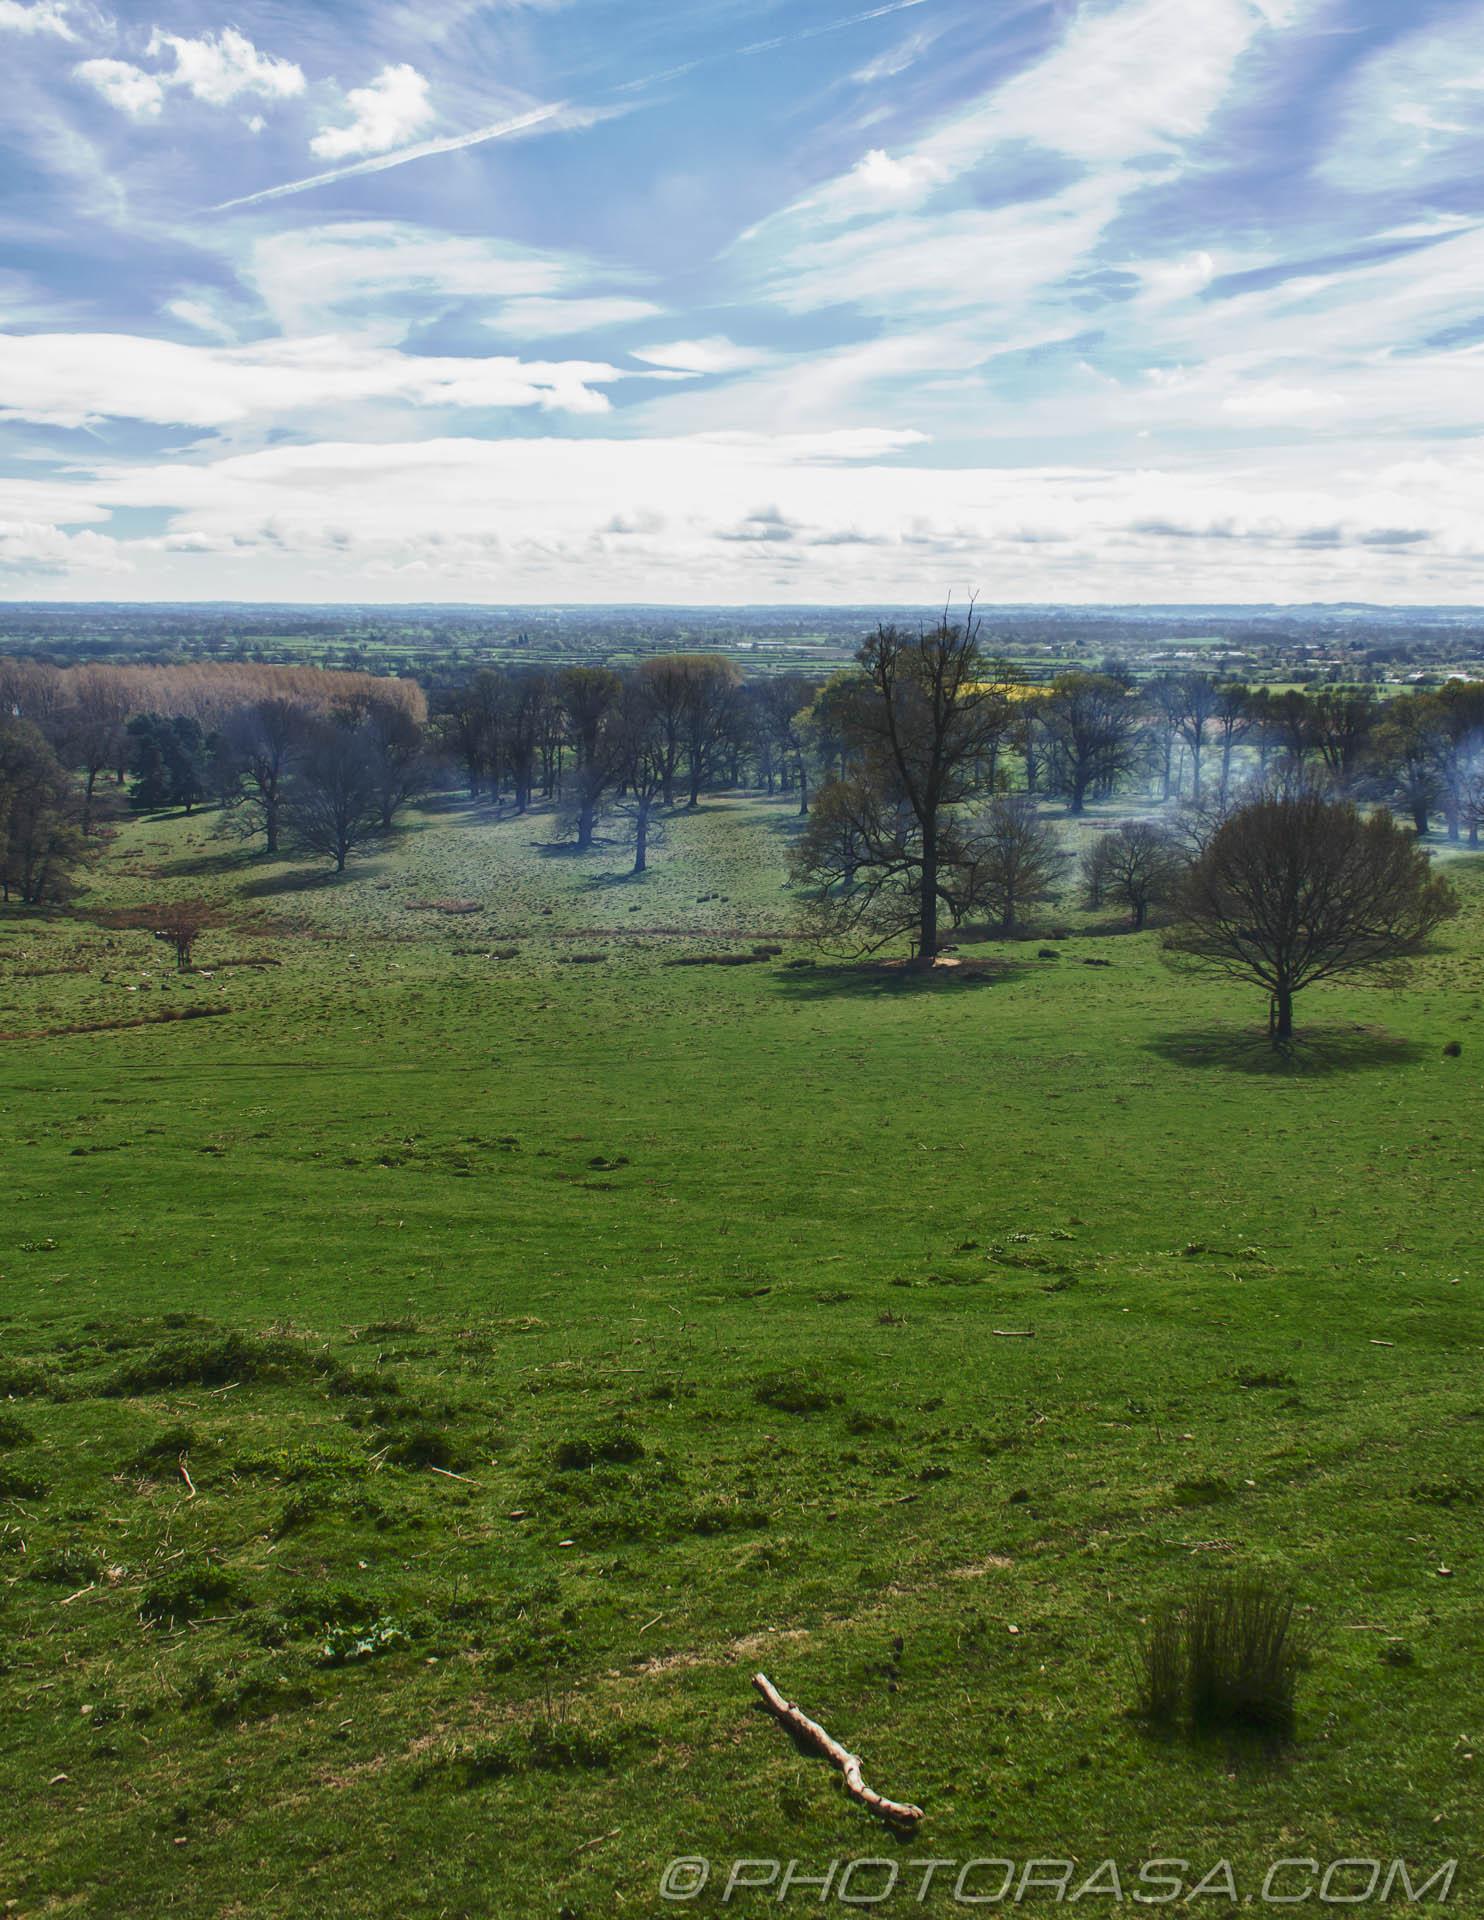 https://photorasa.com/view-boughton-monchelsea-churchyard/view-of-deer-park/